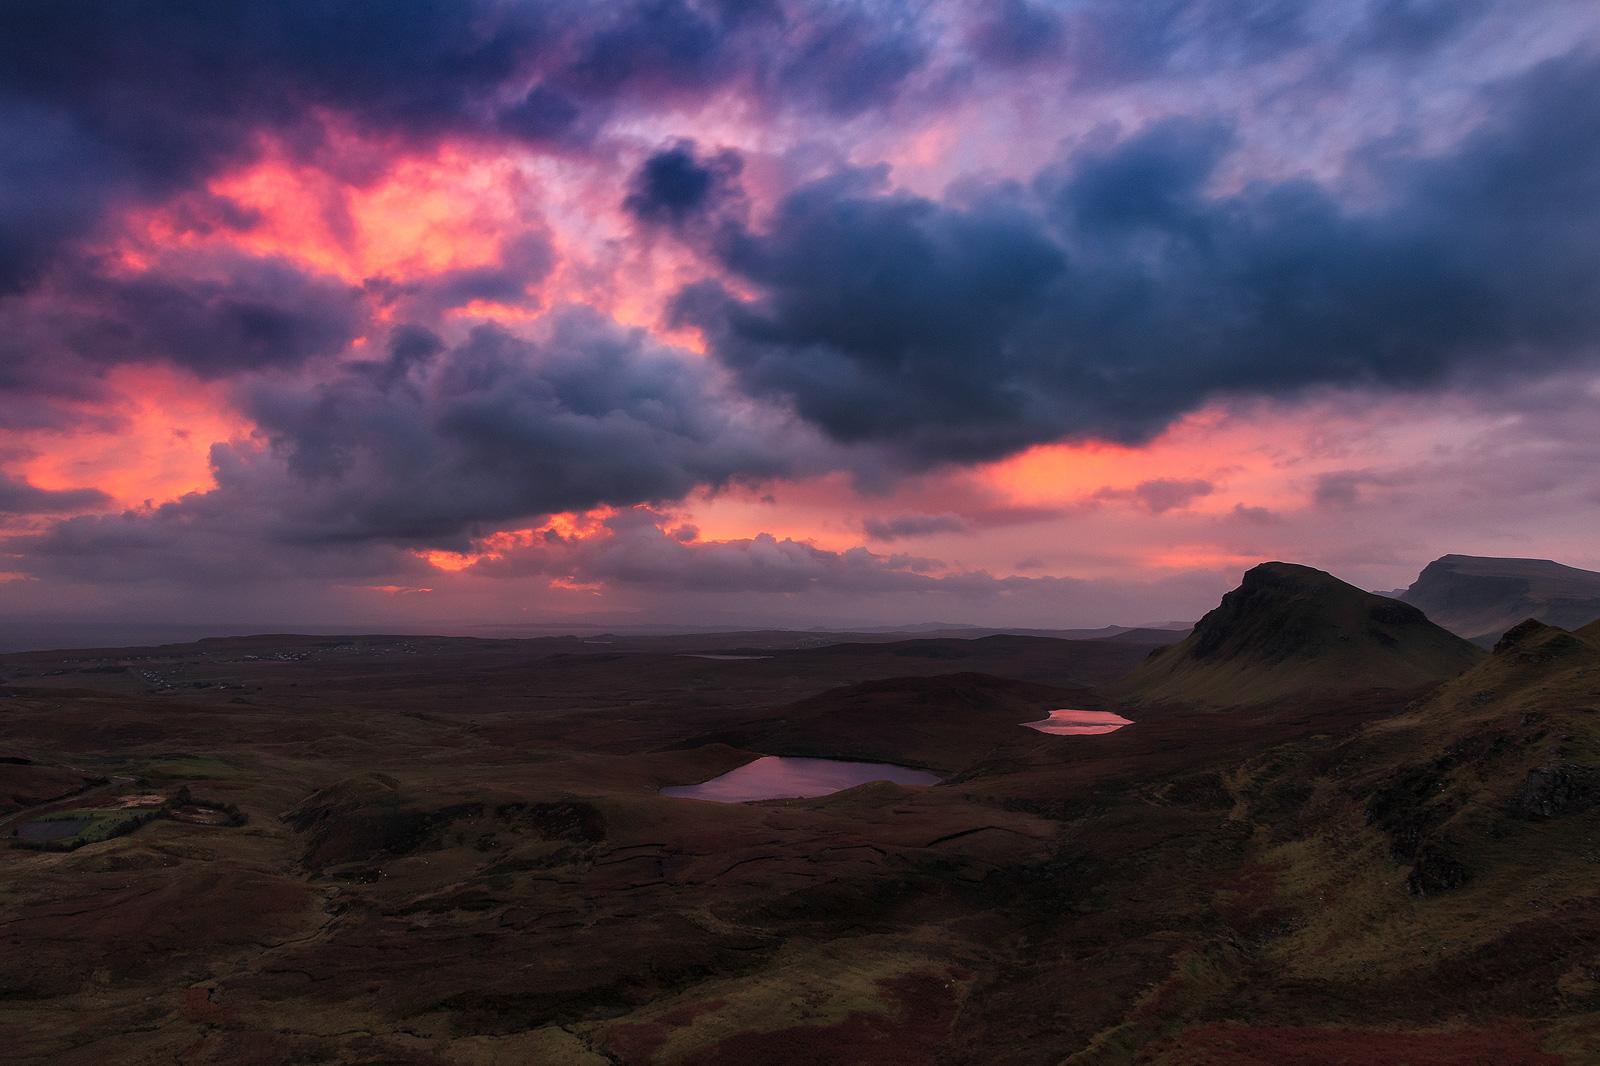 Reisebericht Fotoreise mit Lukas Voegelin, Schottland